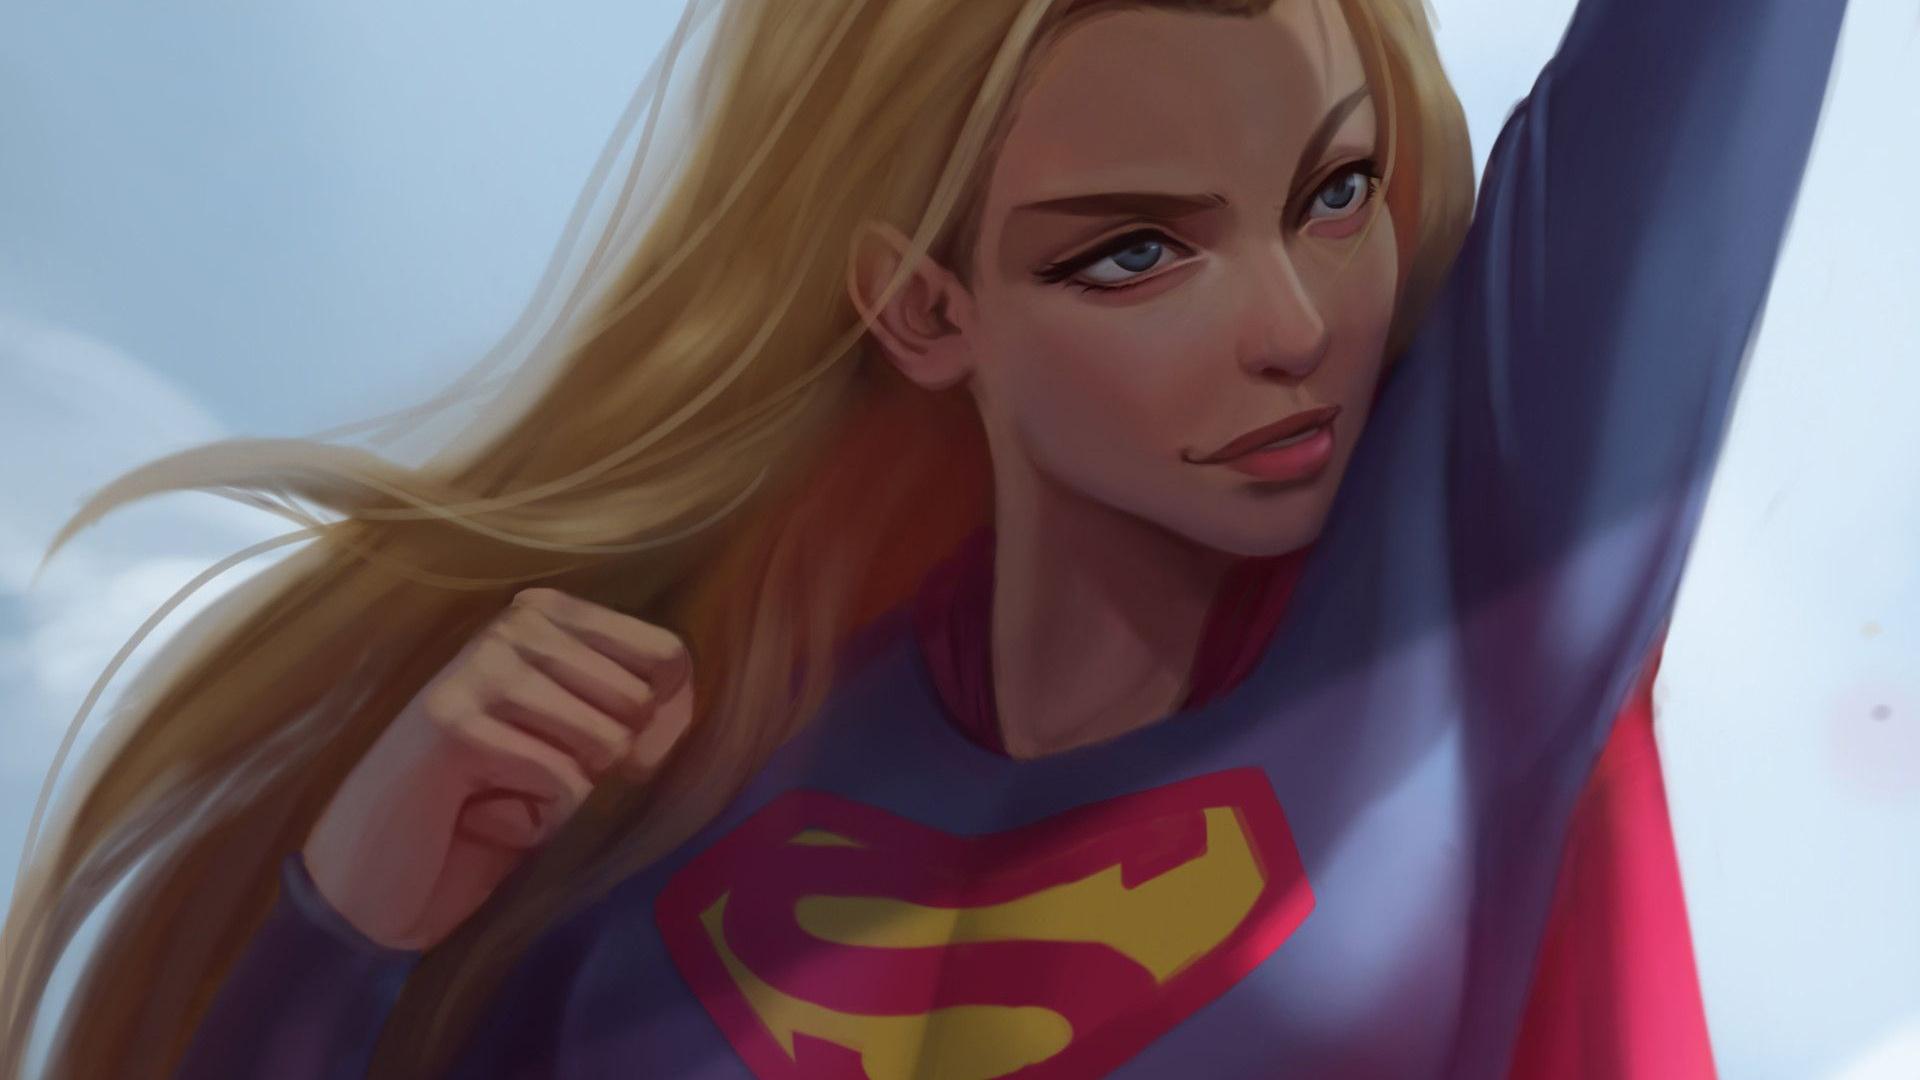 Supergirl free photo